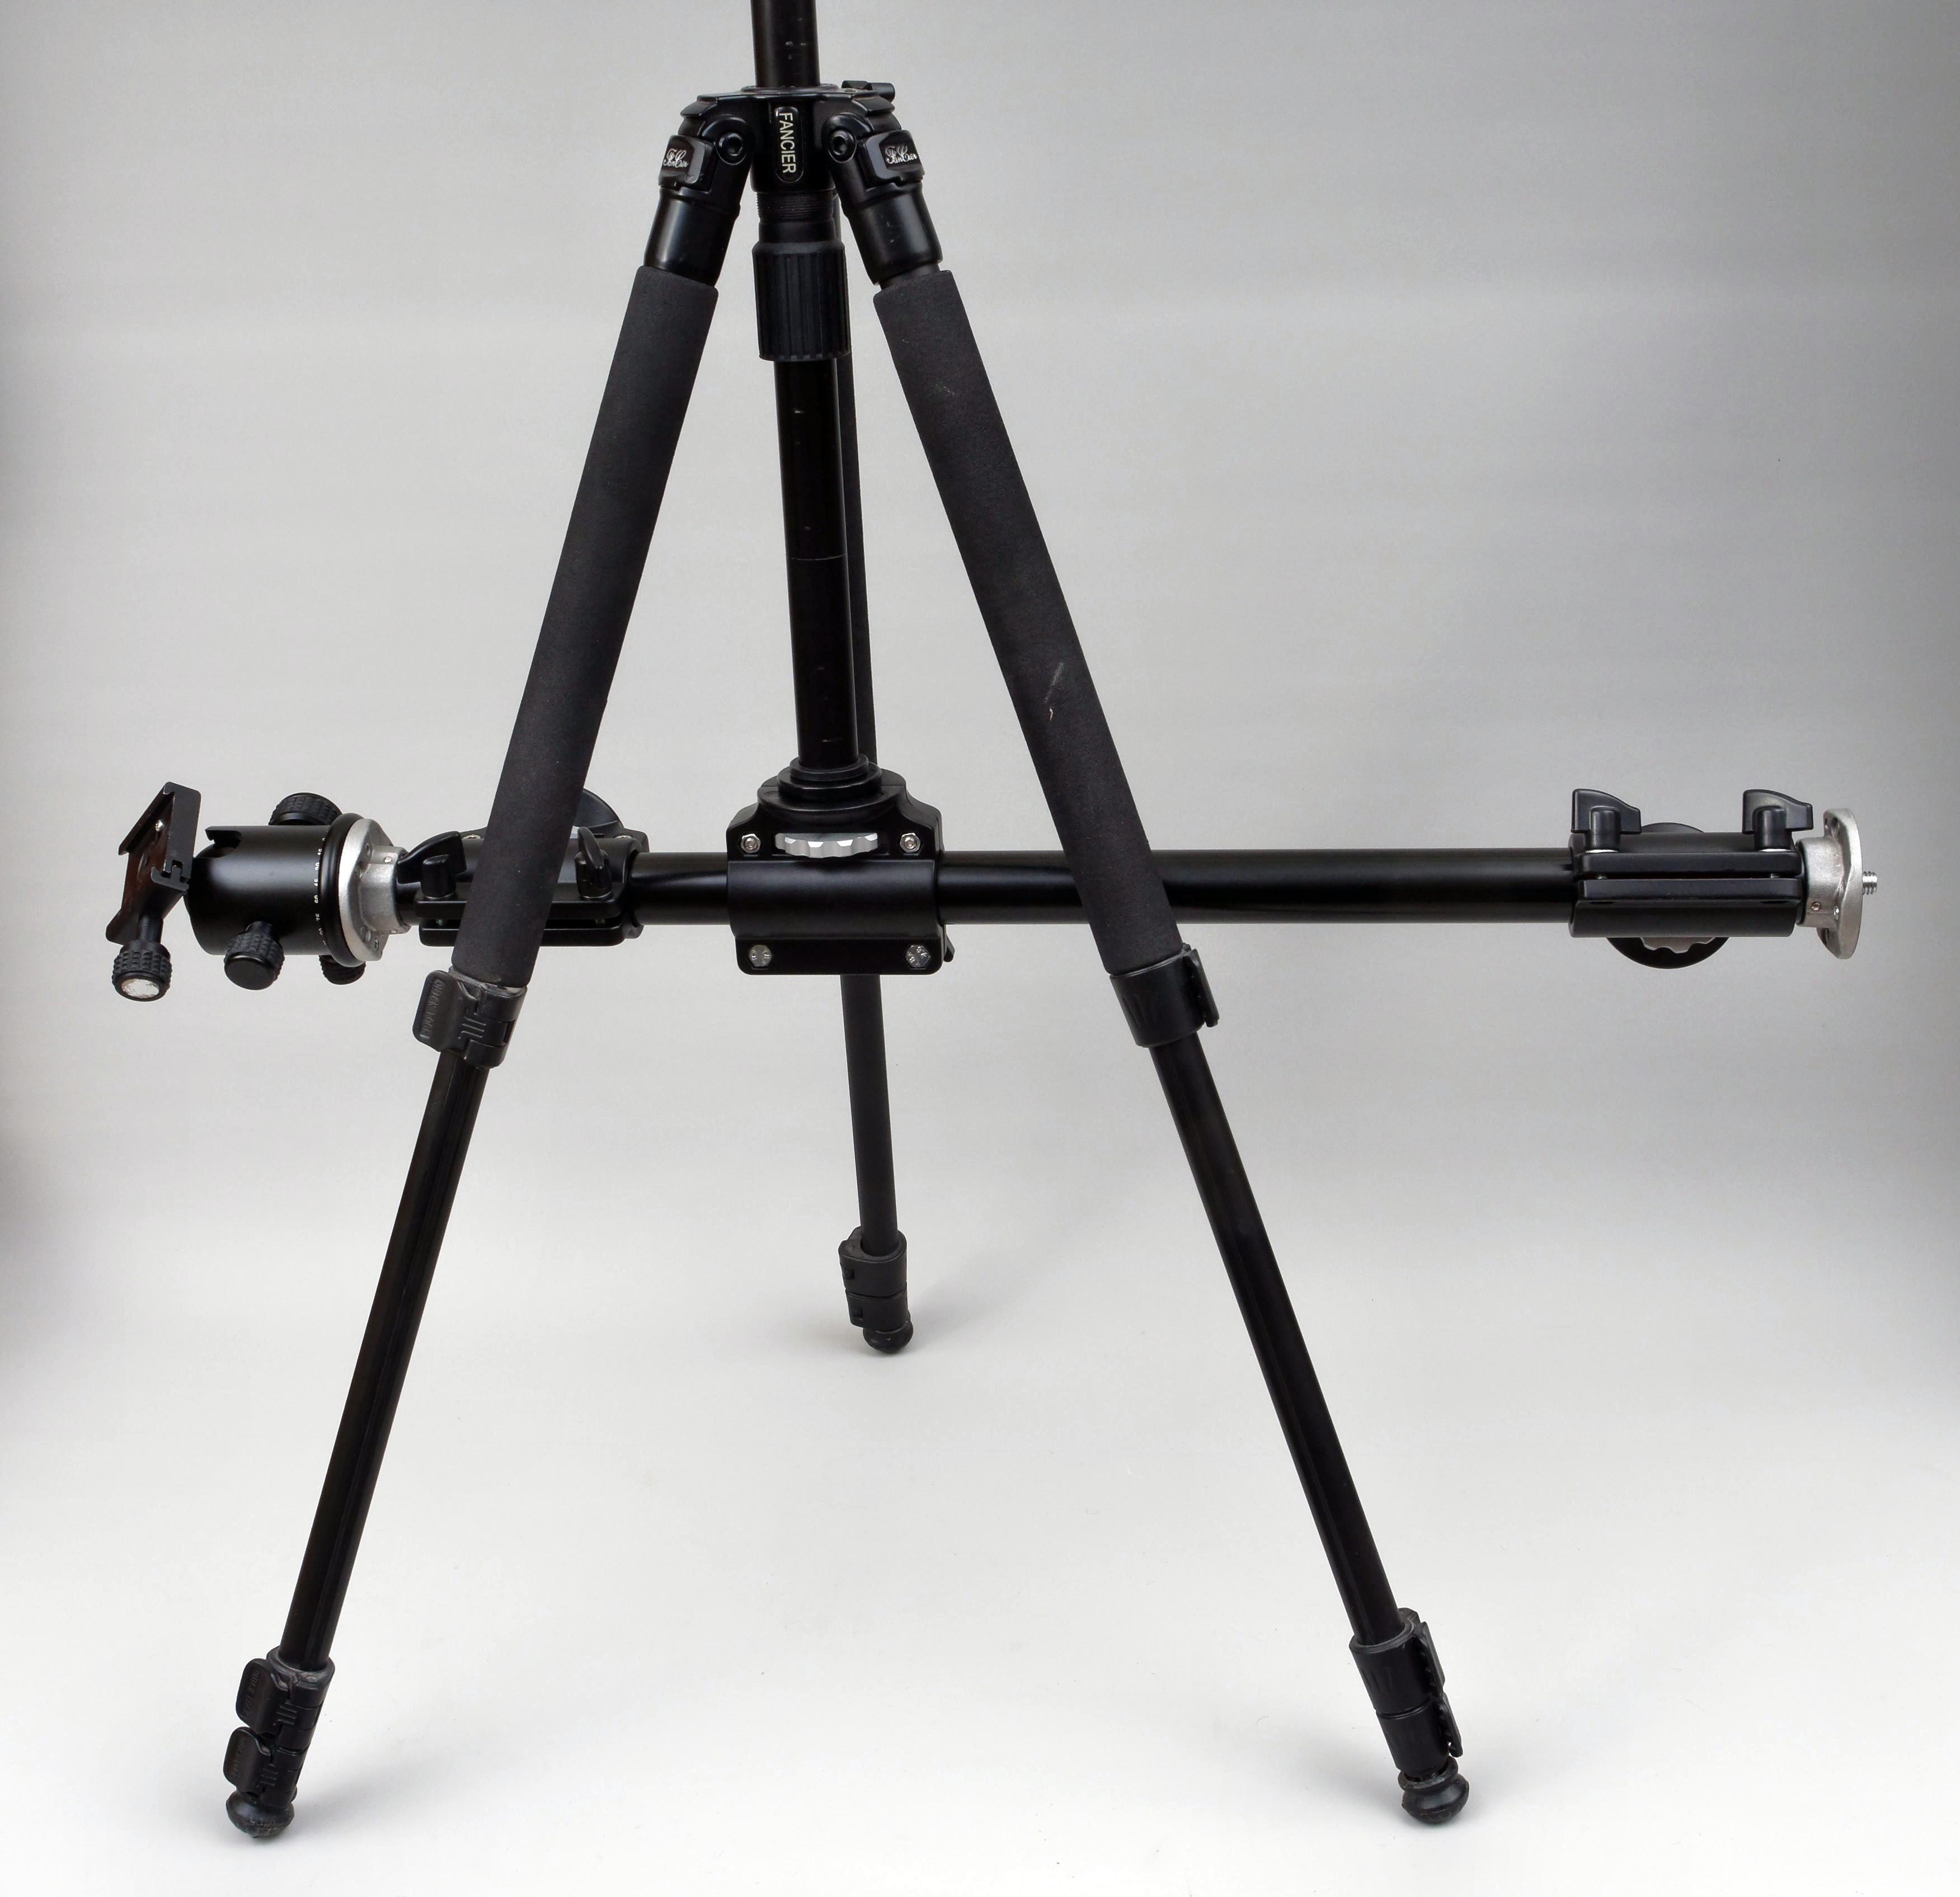 Tripod-arm-4.jpeg